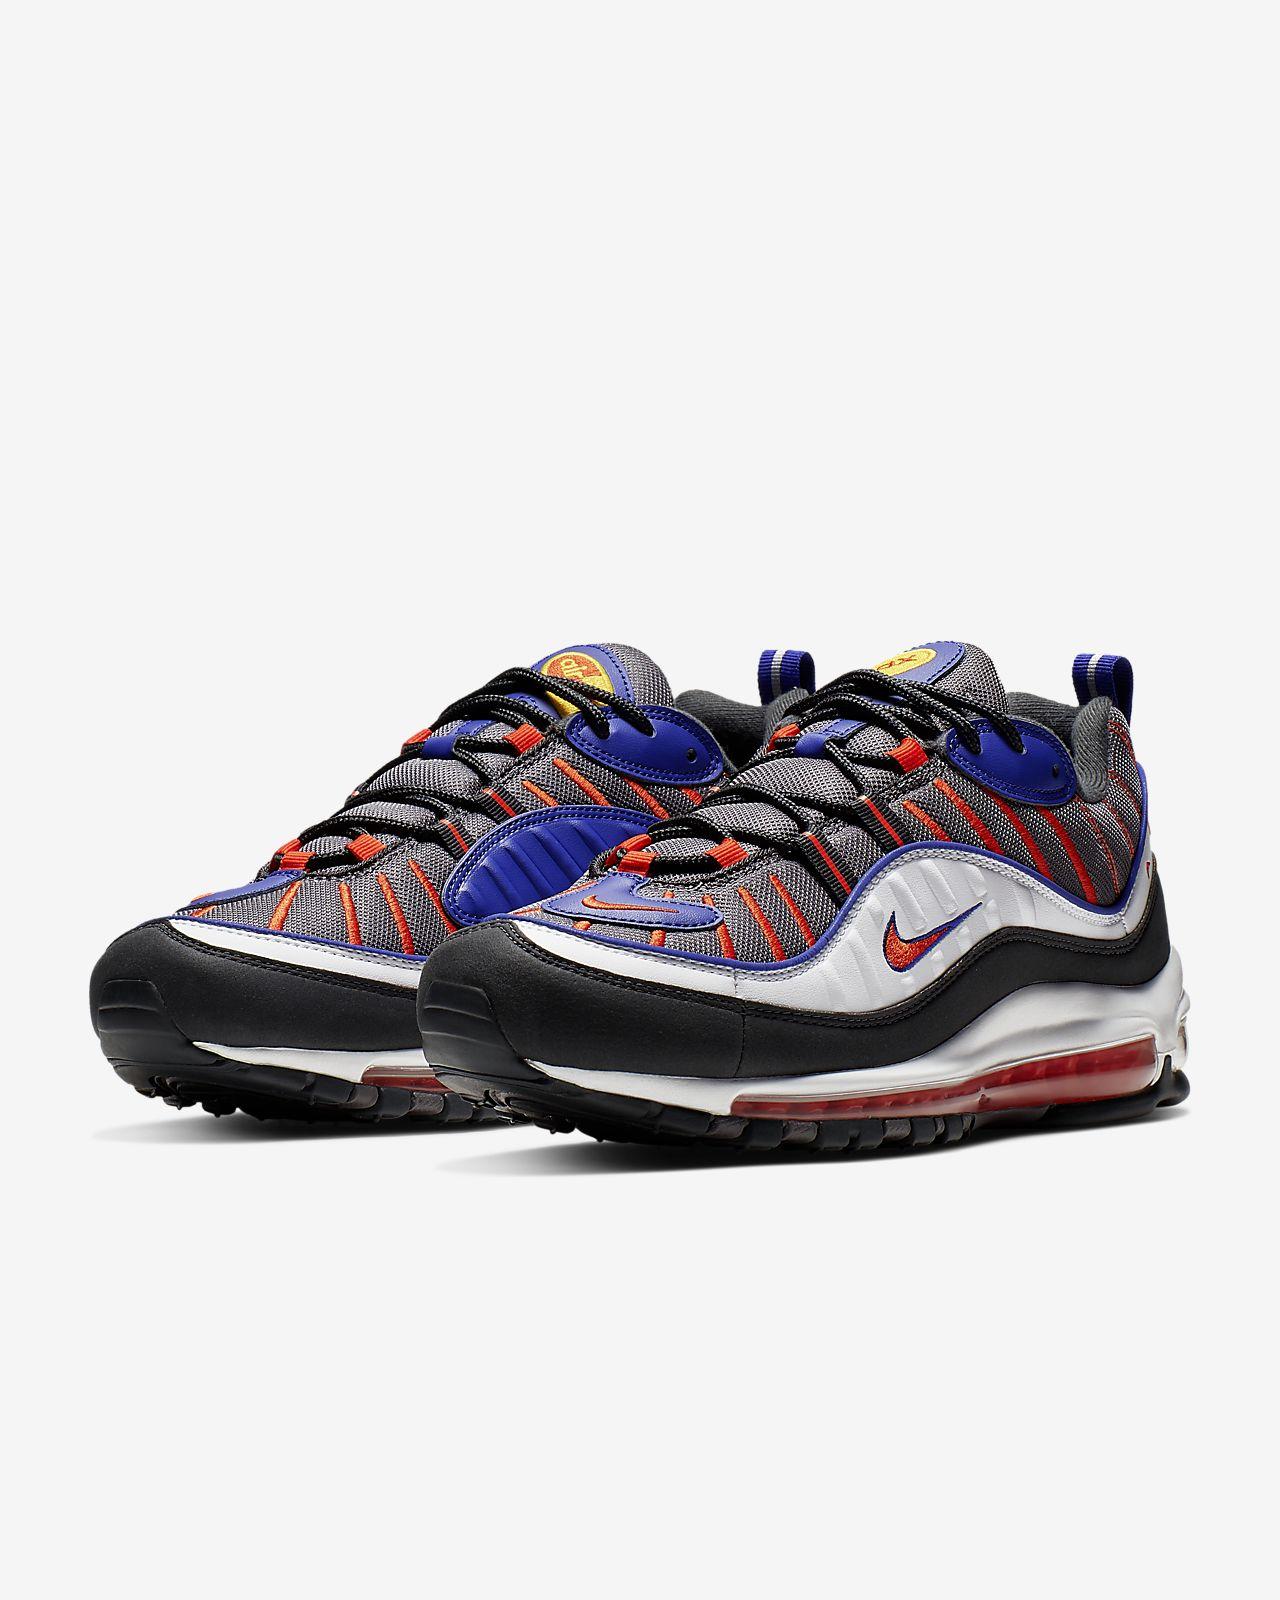 575b396c3a Nike Air Max 98 Men's Shoe. Nike.com NZ